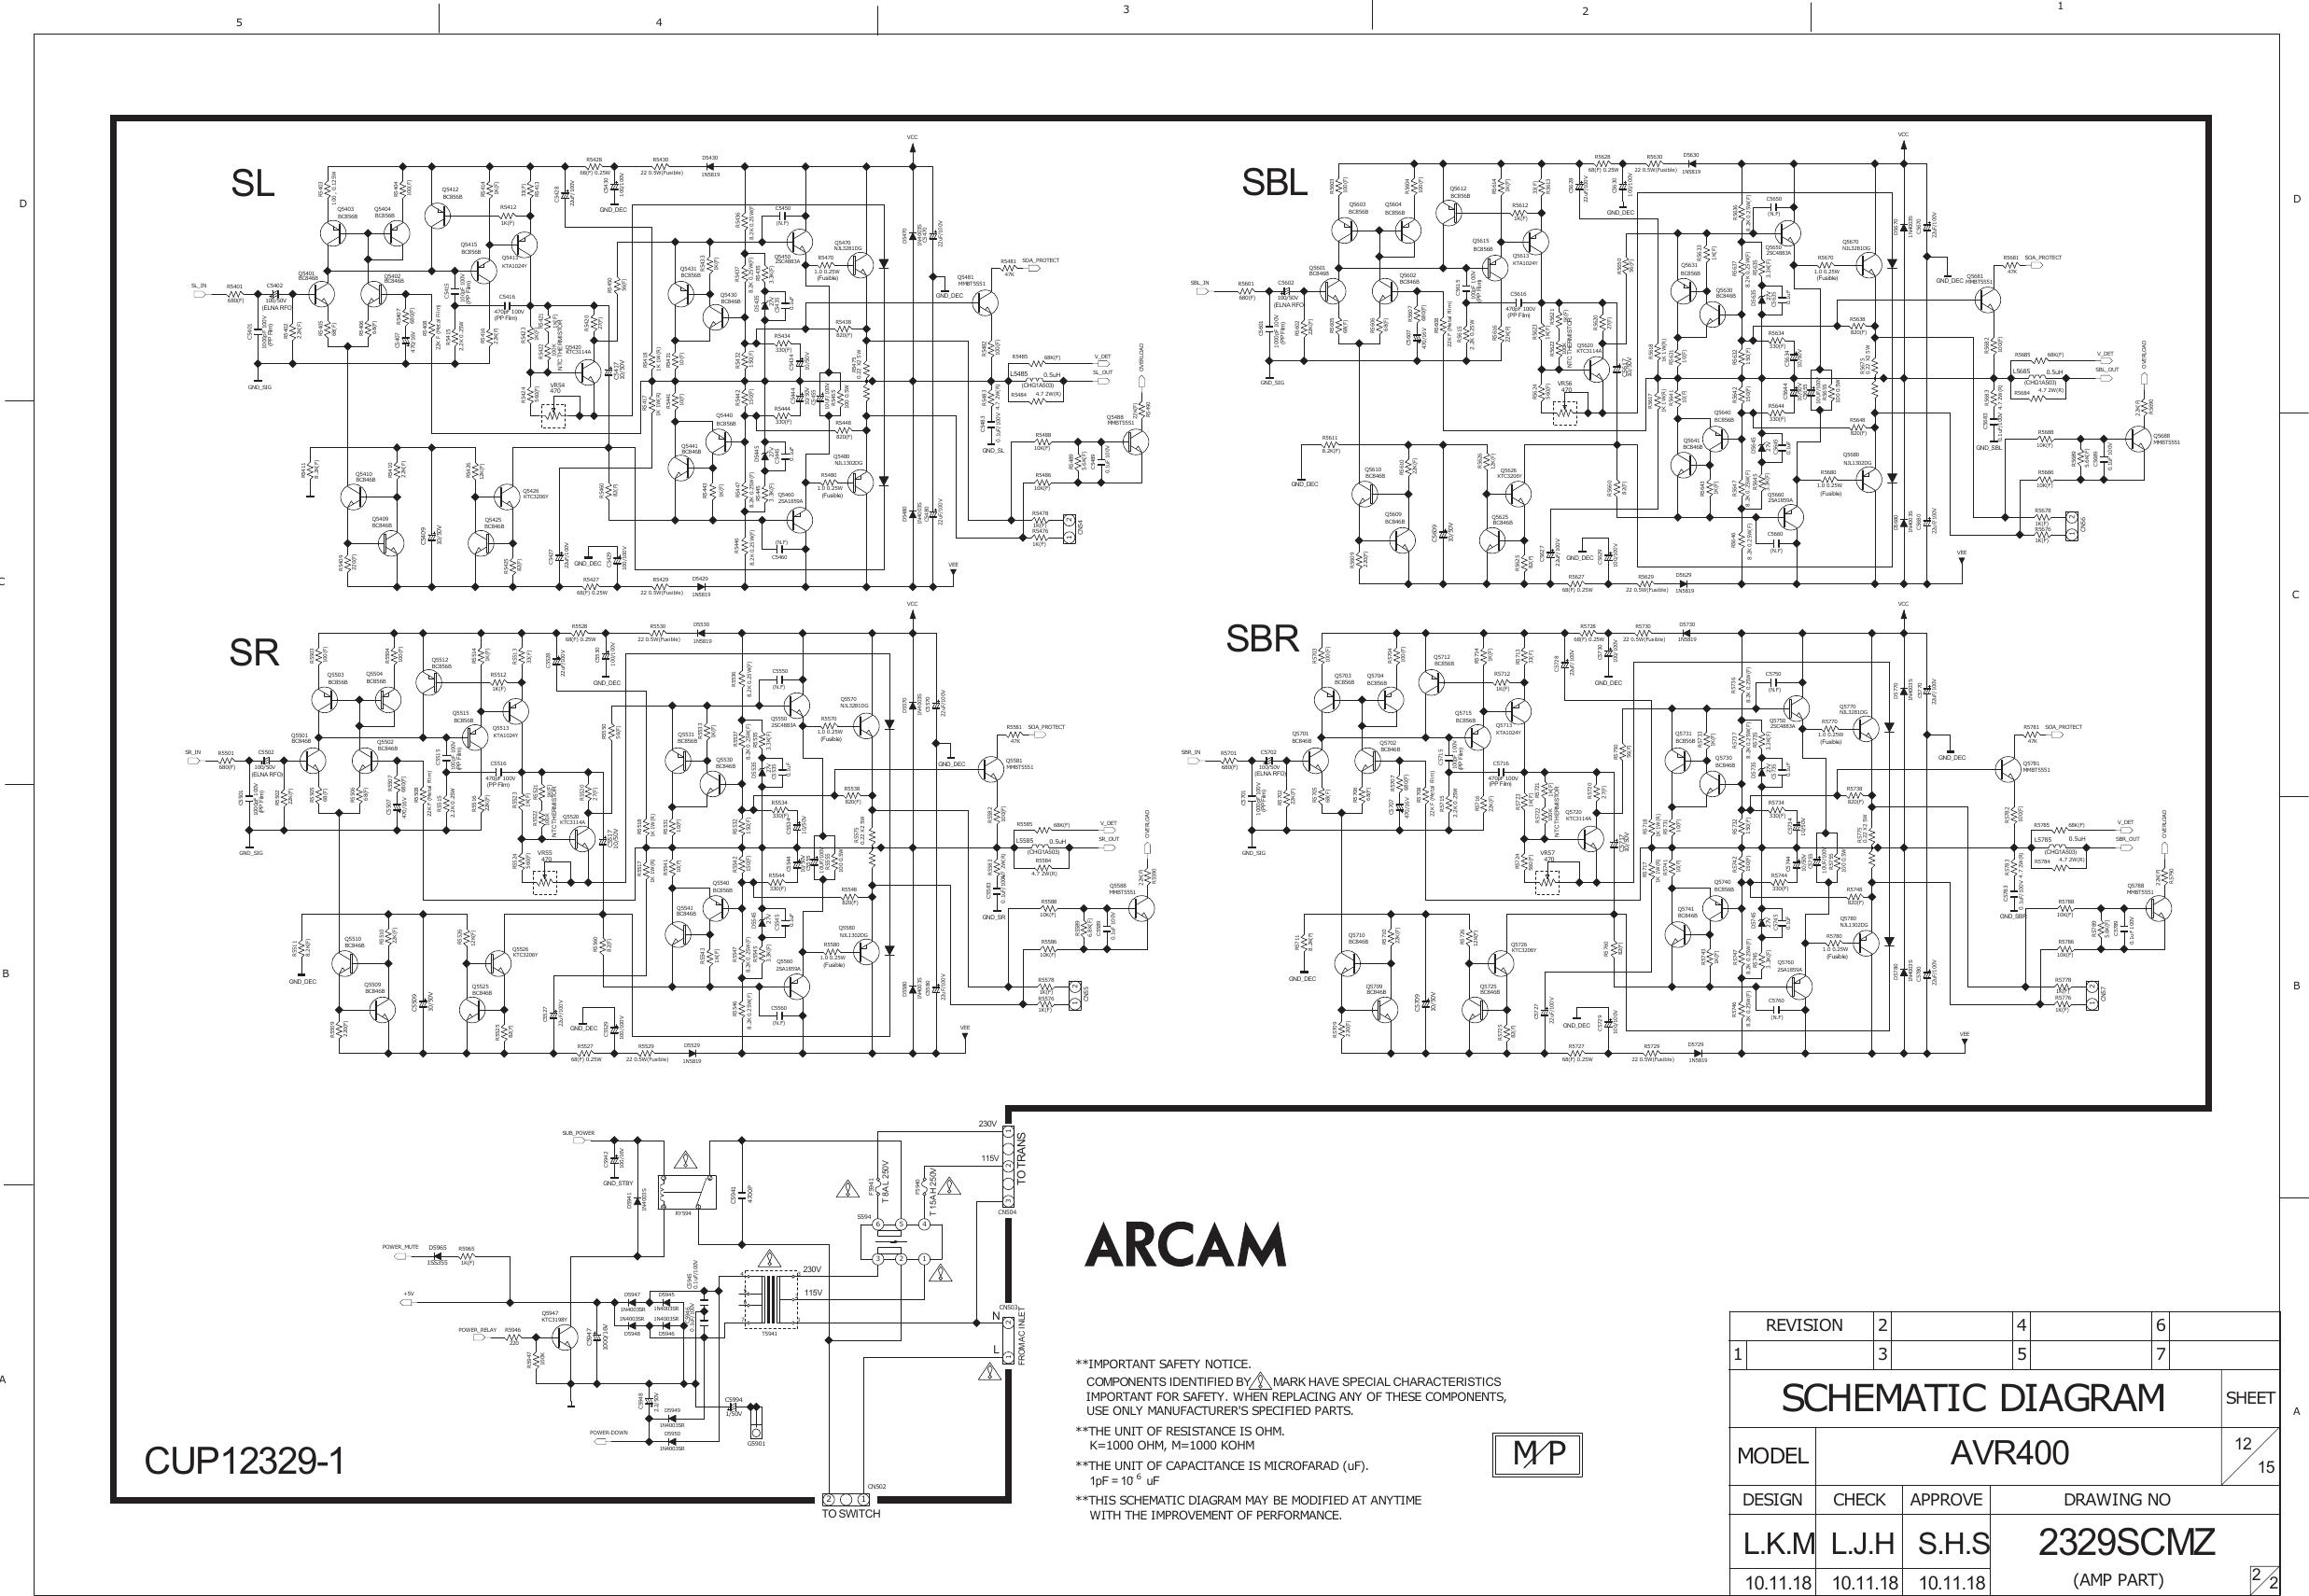 Arcam AVR400 User Manual To The Eca3ebcc 43fb 451b bb2c